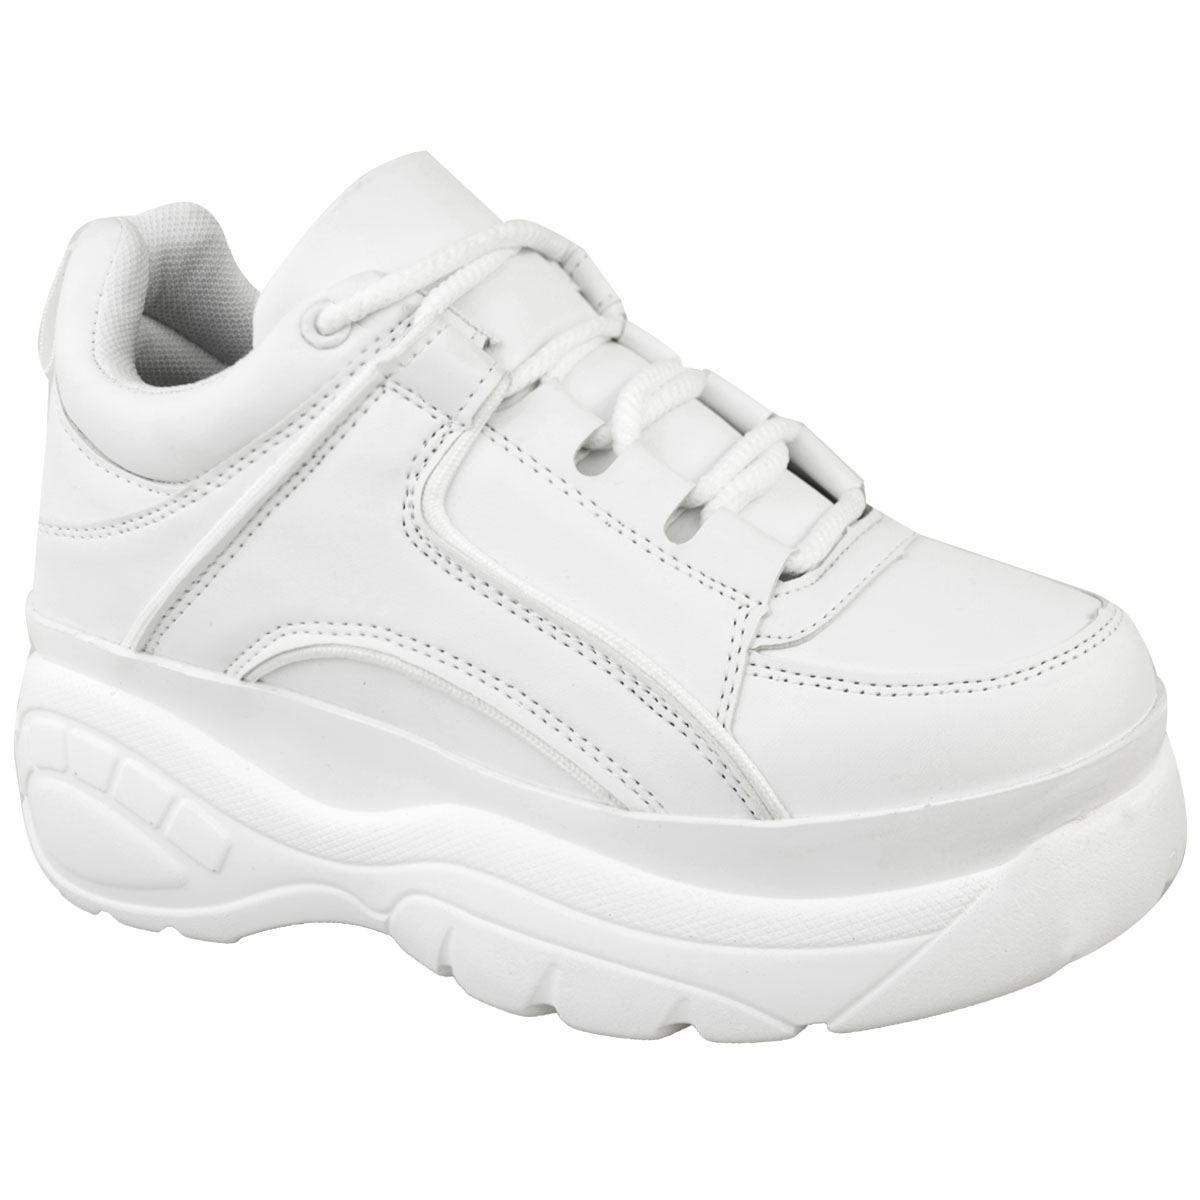 Womens-Ladies-Chunky-High-Platform-Trainers-Sneakers-White-Retro-Punk-Rock-New thumbnail 13